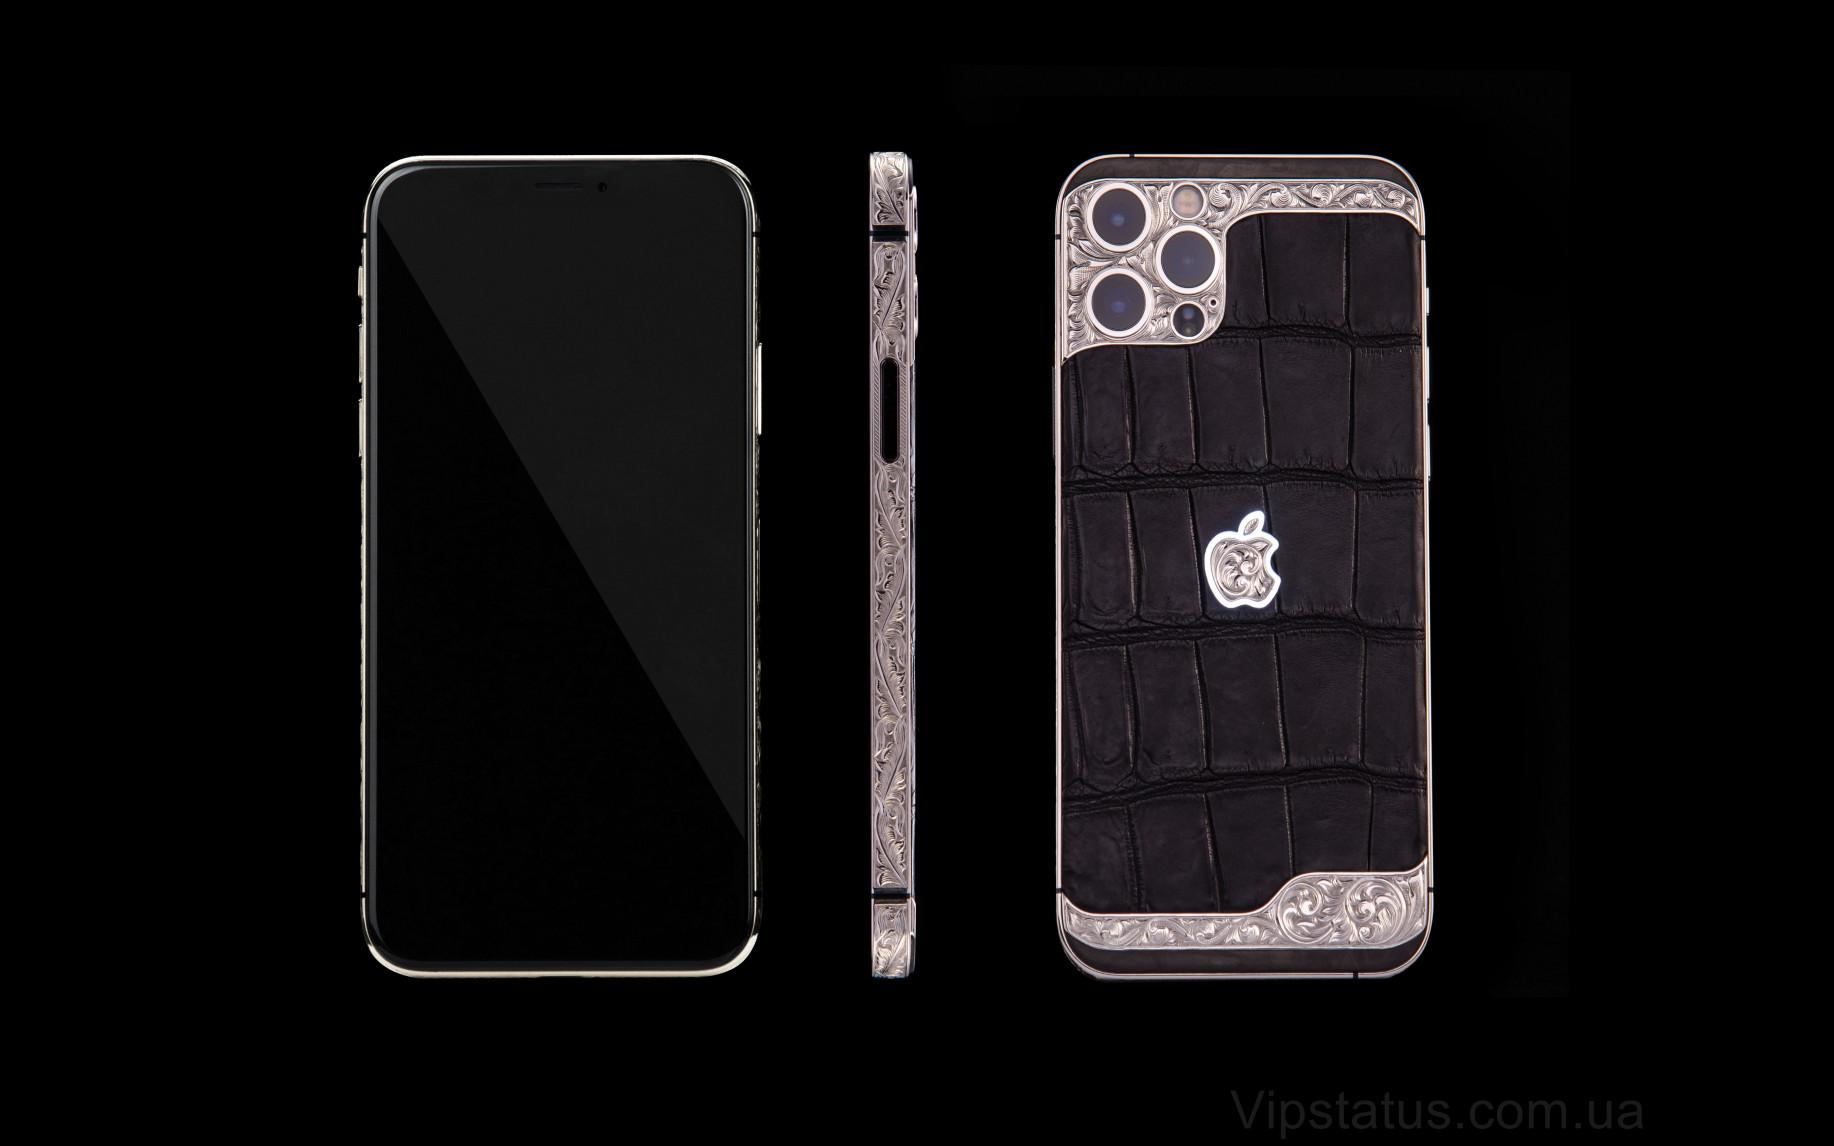 Elite Black Shadow IPHONE 12 PRO MAX 512 GB Black Shadow IPHONE 12 PRO MAX 512 GB image 9